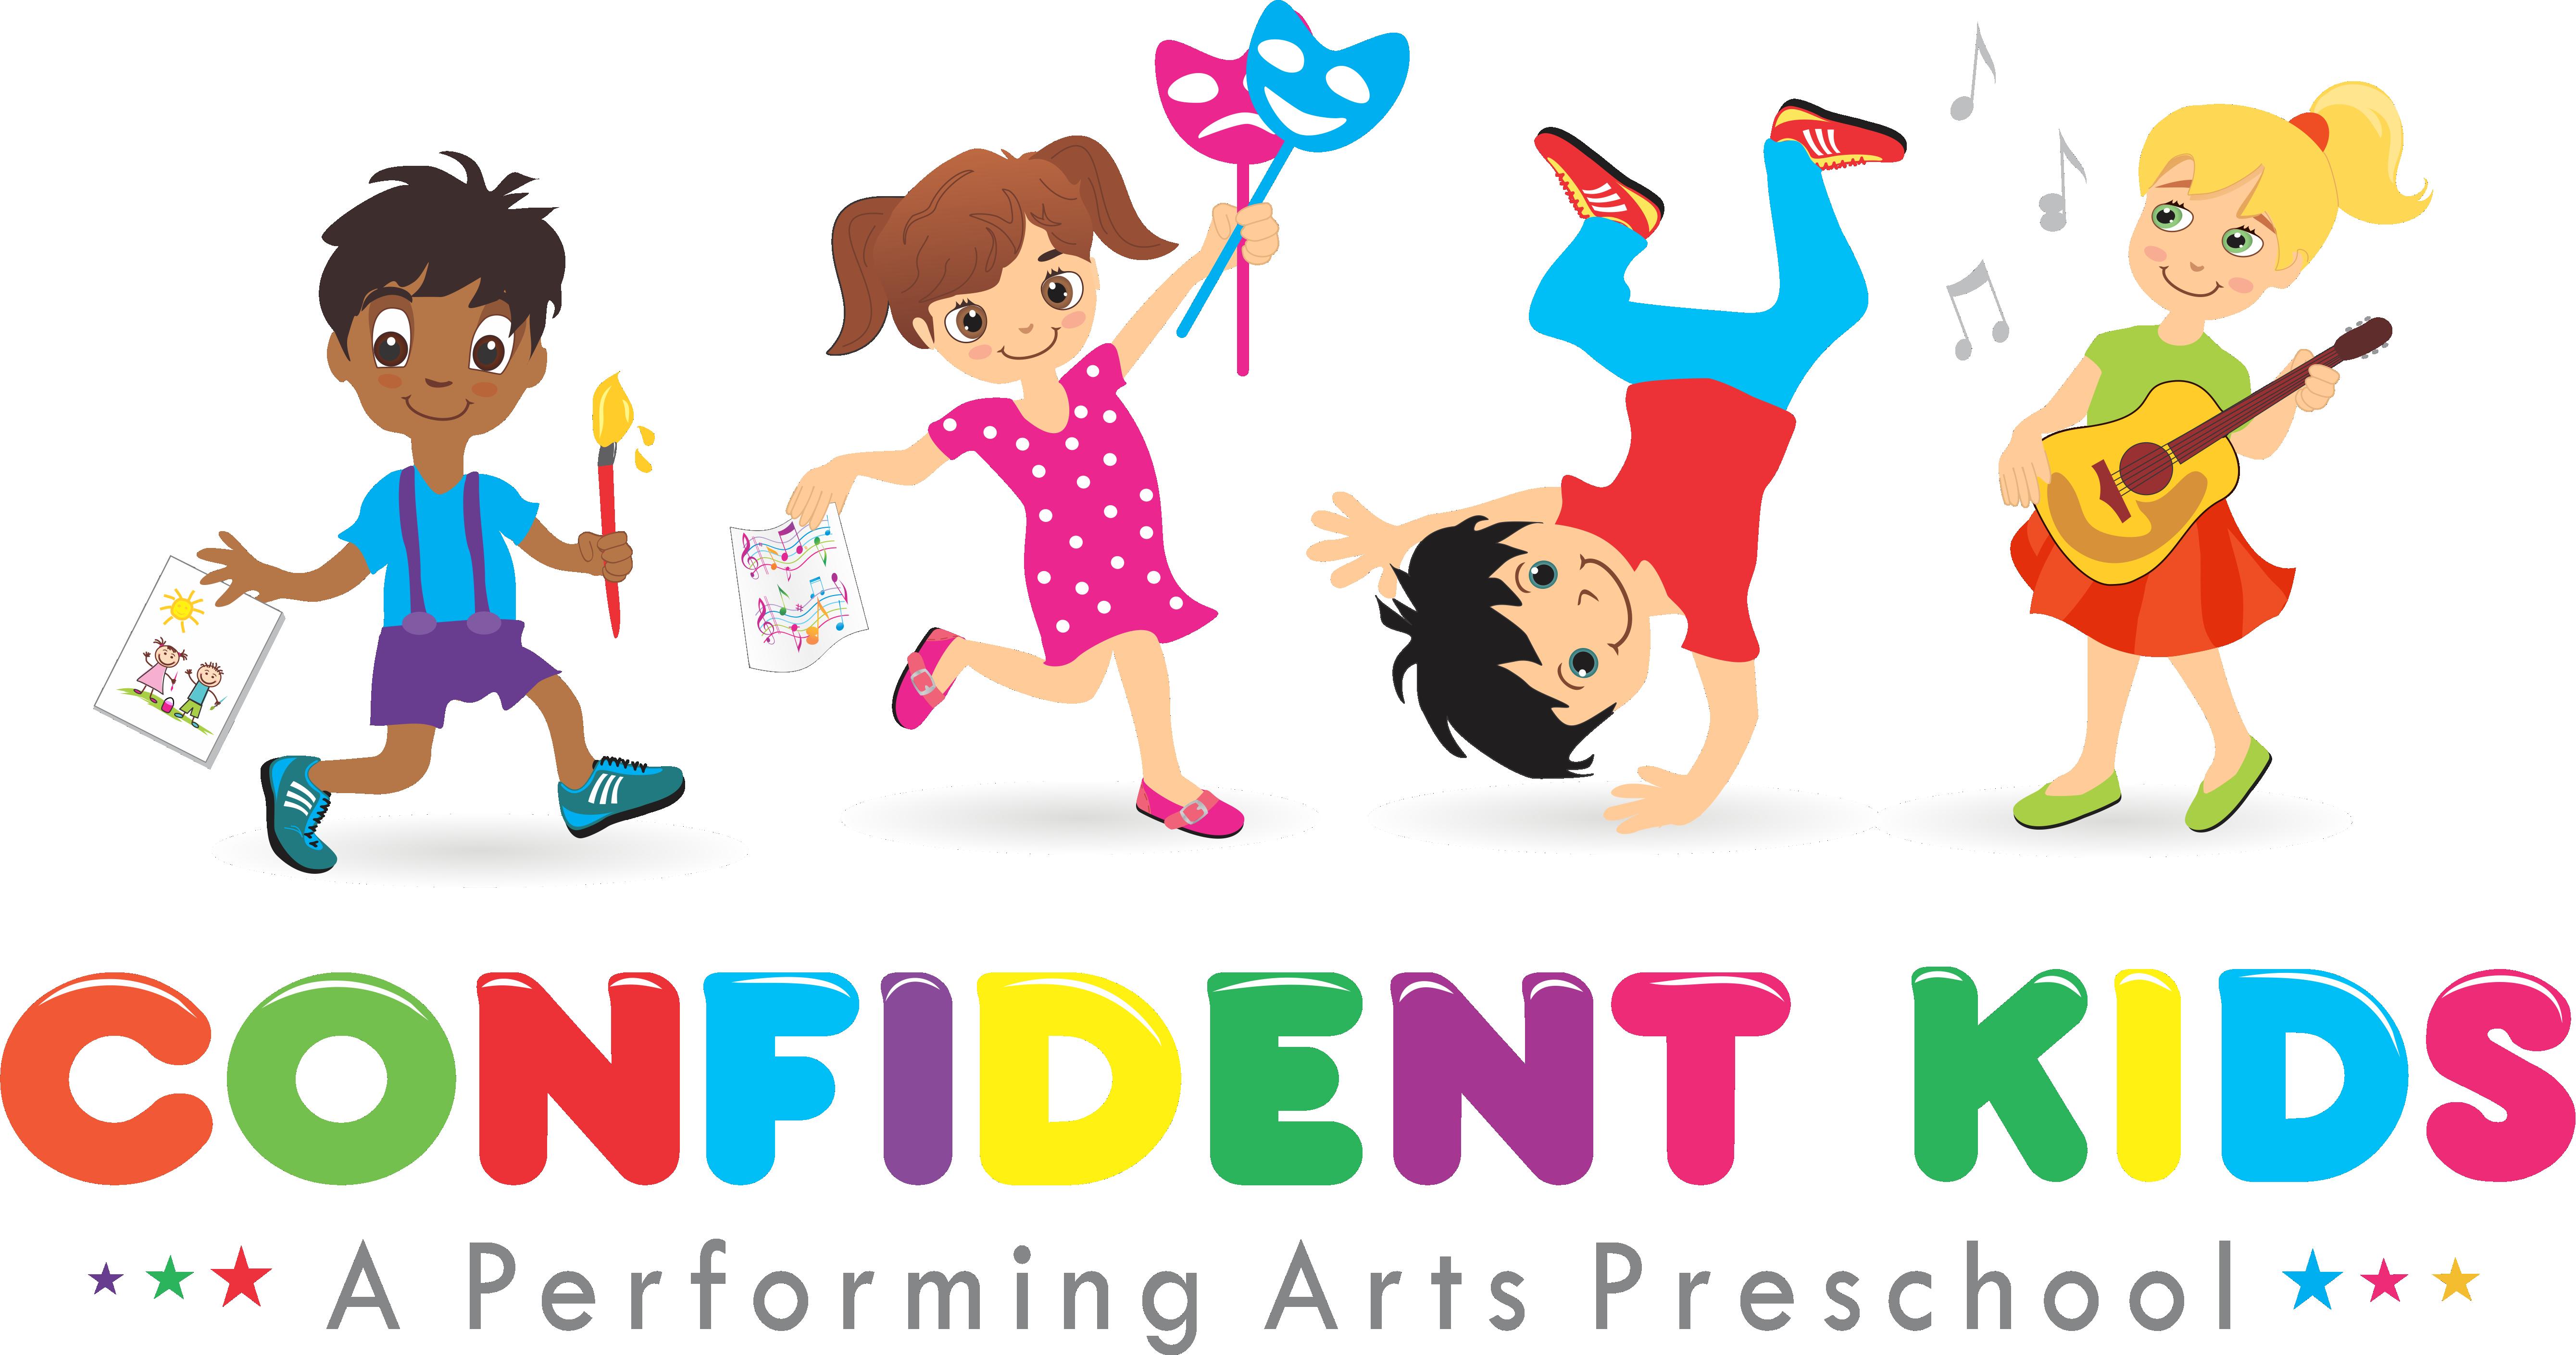 Love kids? Design a fun, colourful, creative logo for my Performing Arts Preschool